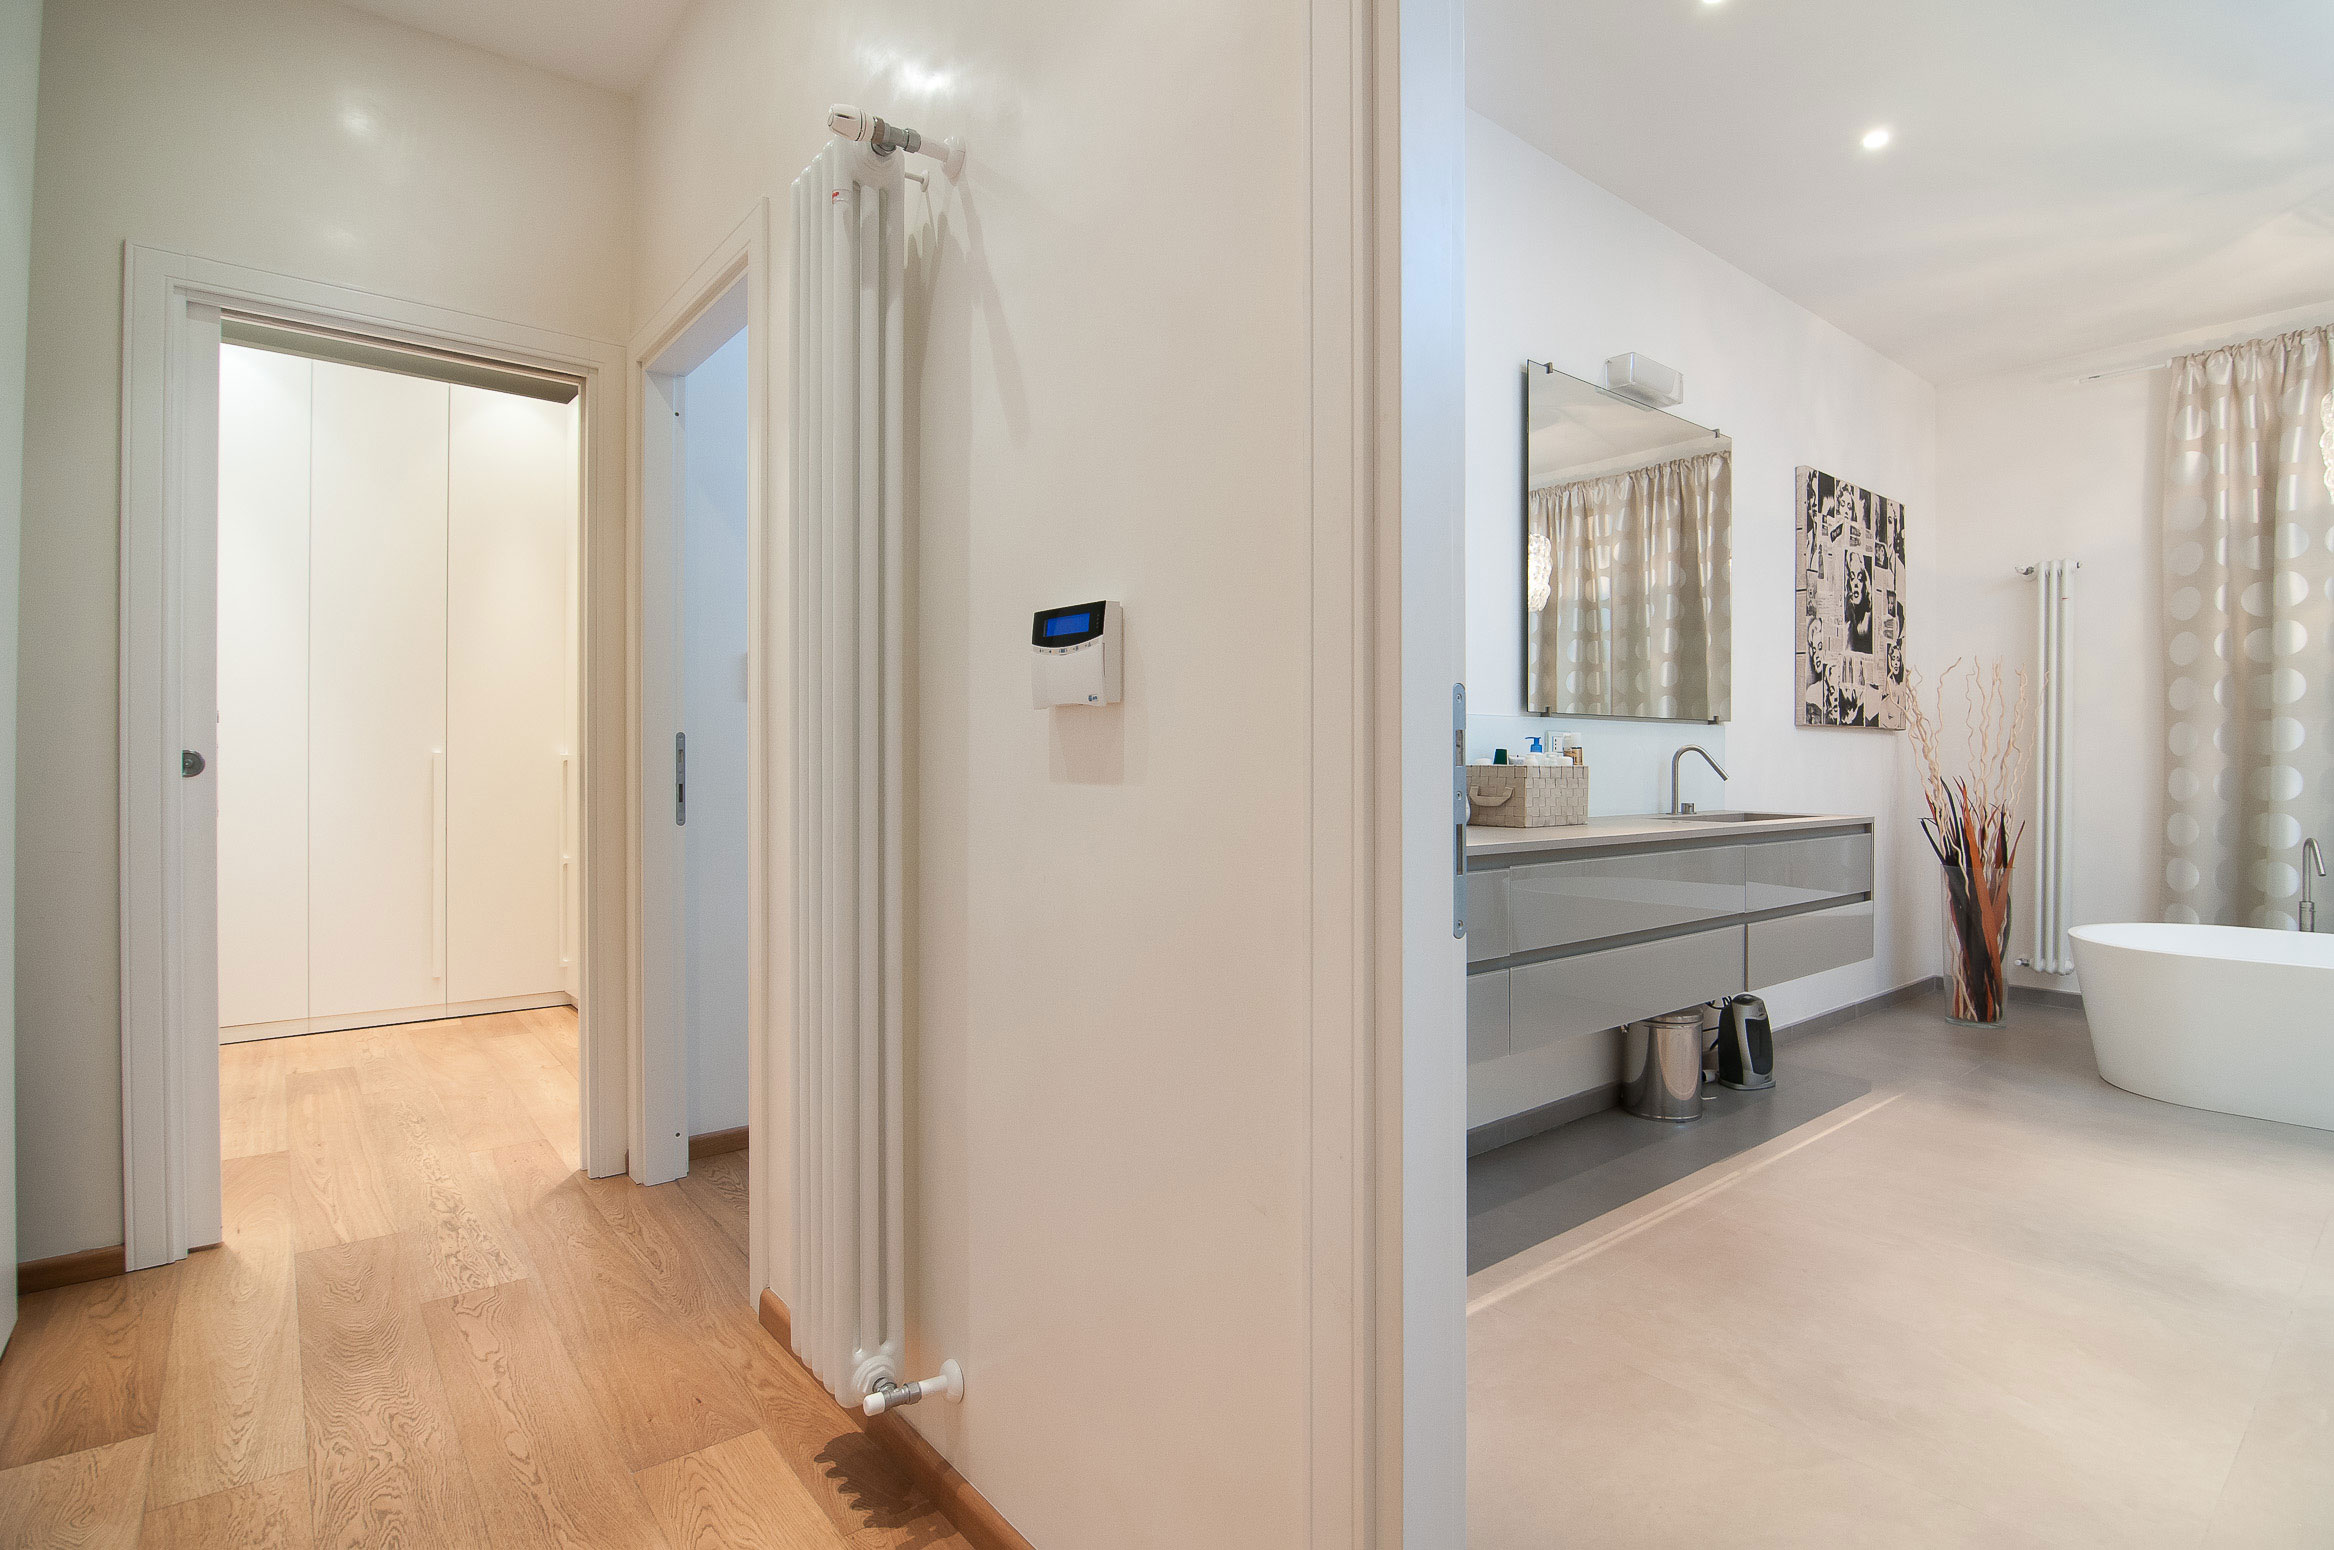 CM Apartment in Rome by 3C+t Capolei Cavalli a.a.-15